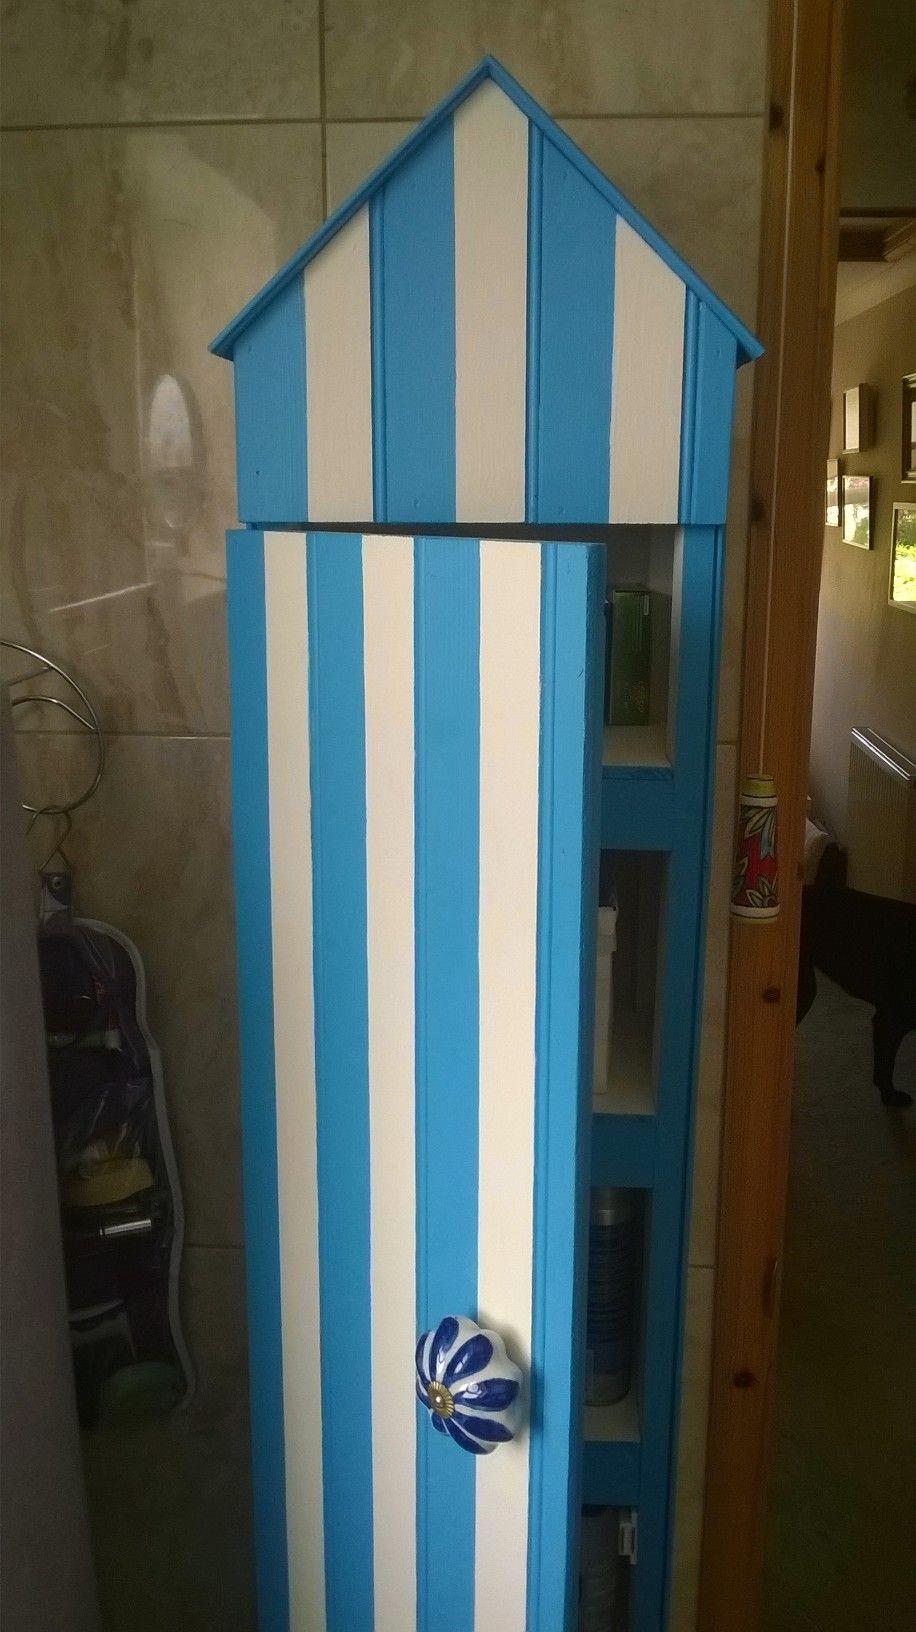 Beach hut style bathroom - Tall Beach Hut Style Bathroom Cabinet Made From Oddments Of Wood